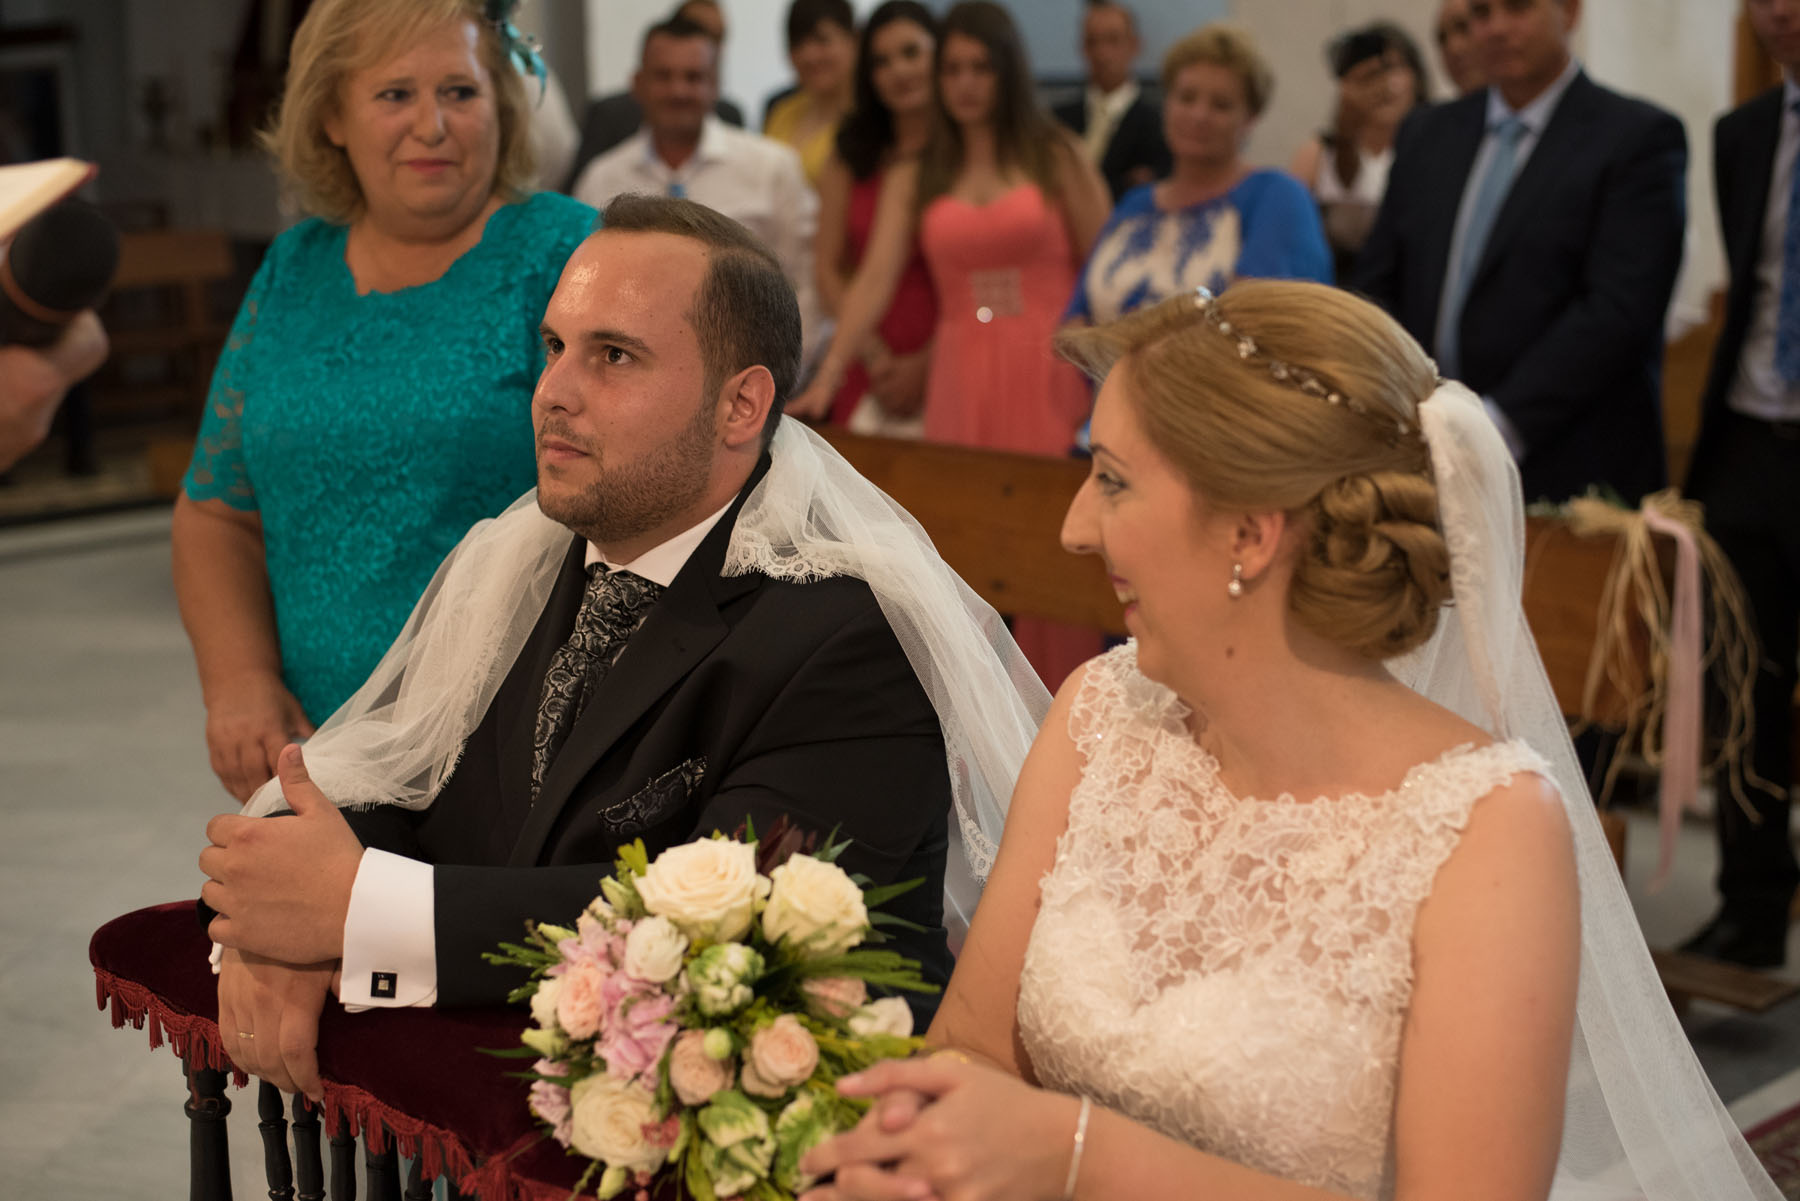 fotografo profesional de bodas en caceres y badajoz